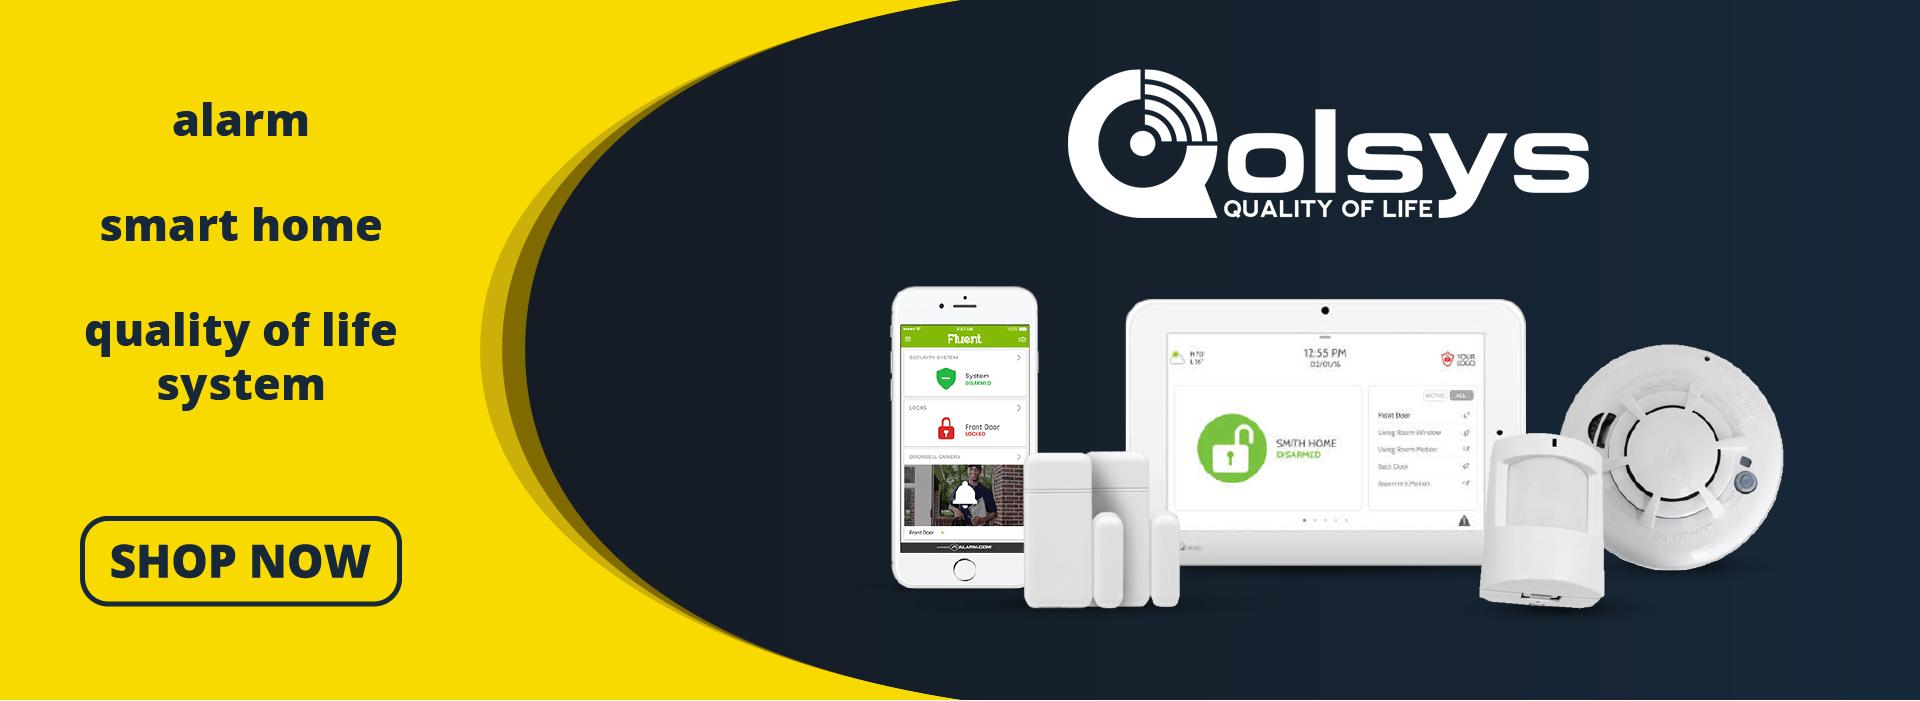 New Qolsys Alarm Panels Available Now!